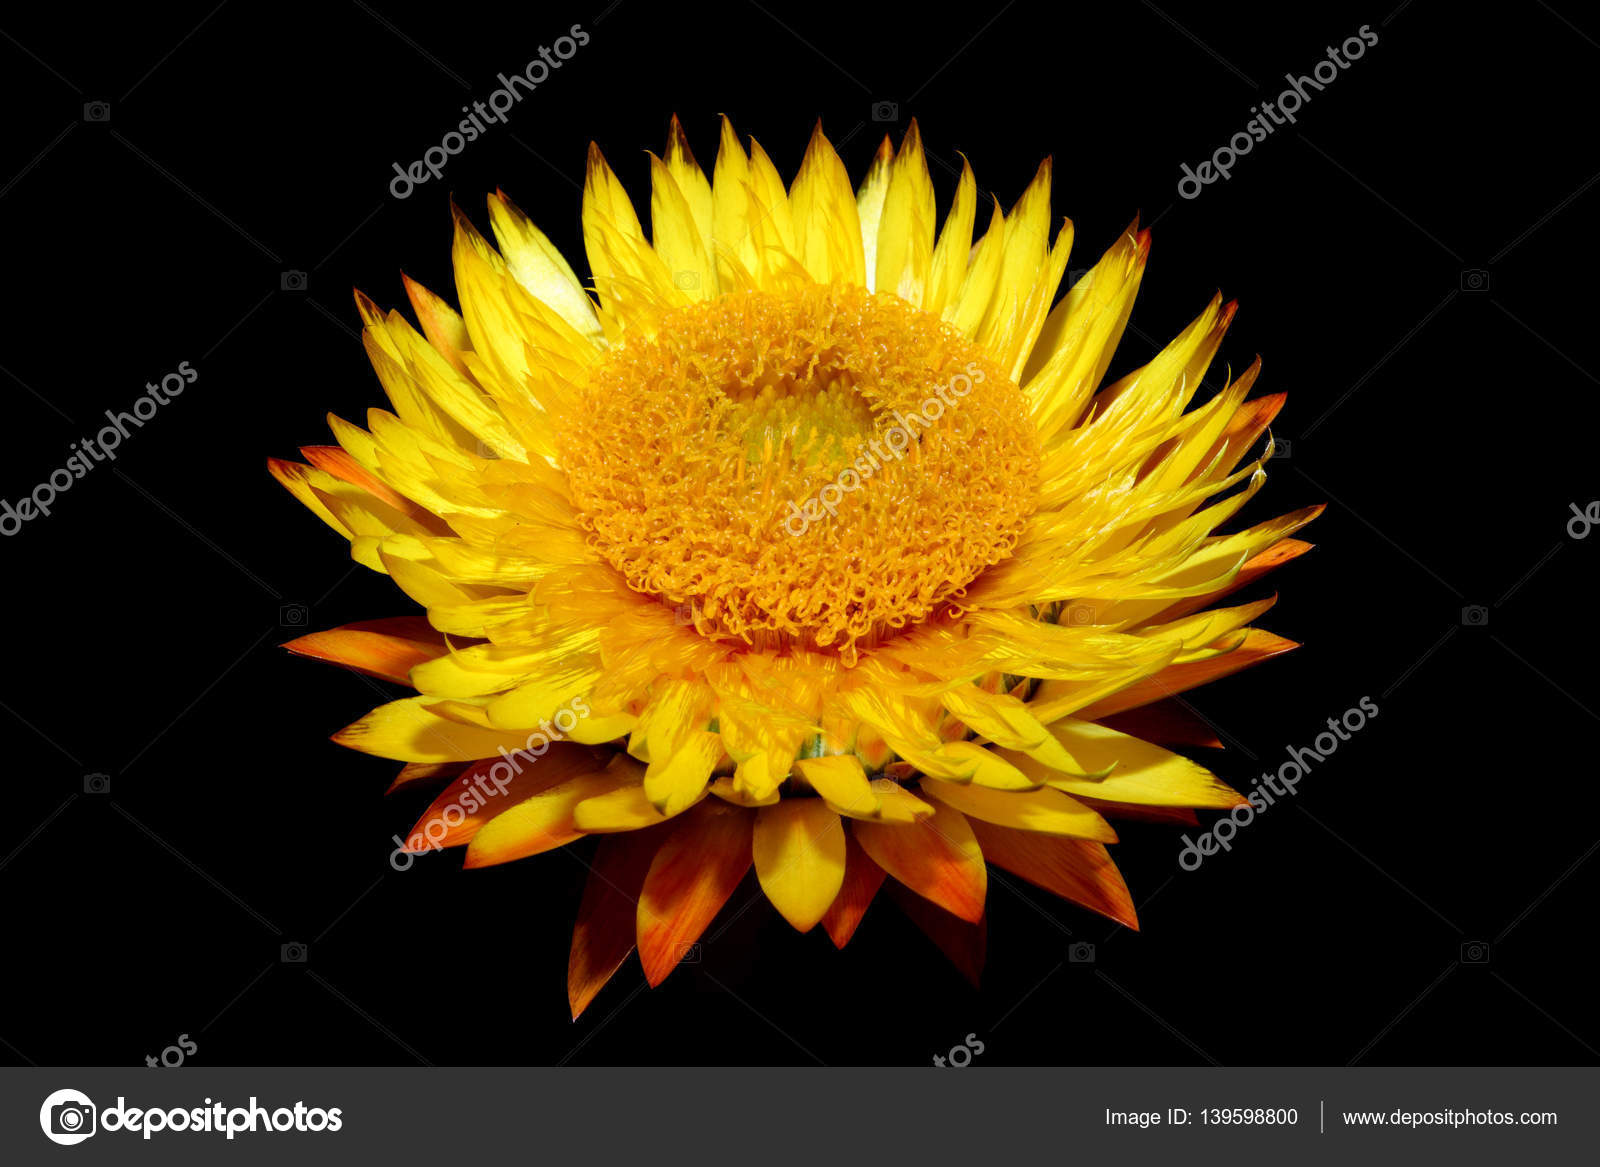 Helichysum yellow flower stock photo lenschanger 139598800 helichysum yellow is a common perennial flower sometimes called everlasting photo by lenschanger mightylinksfo